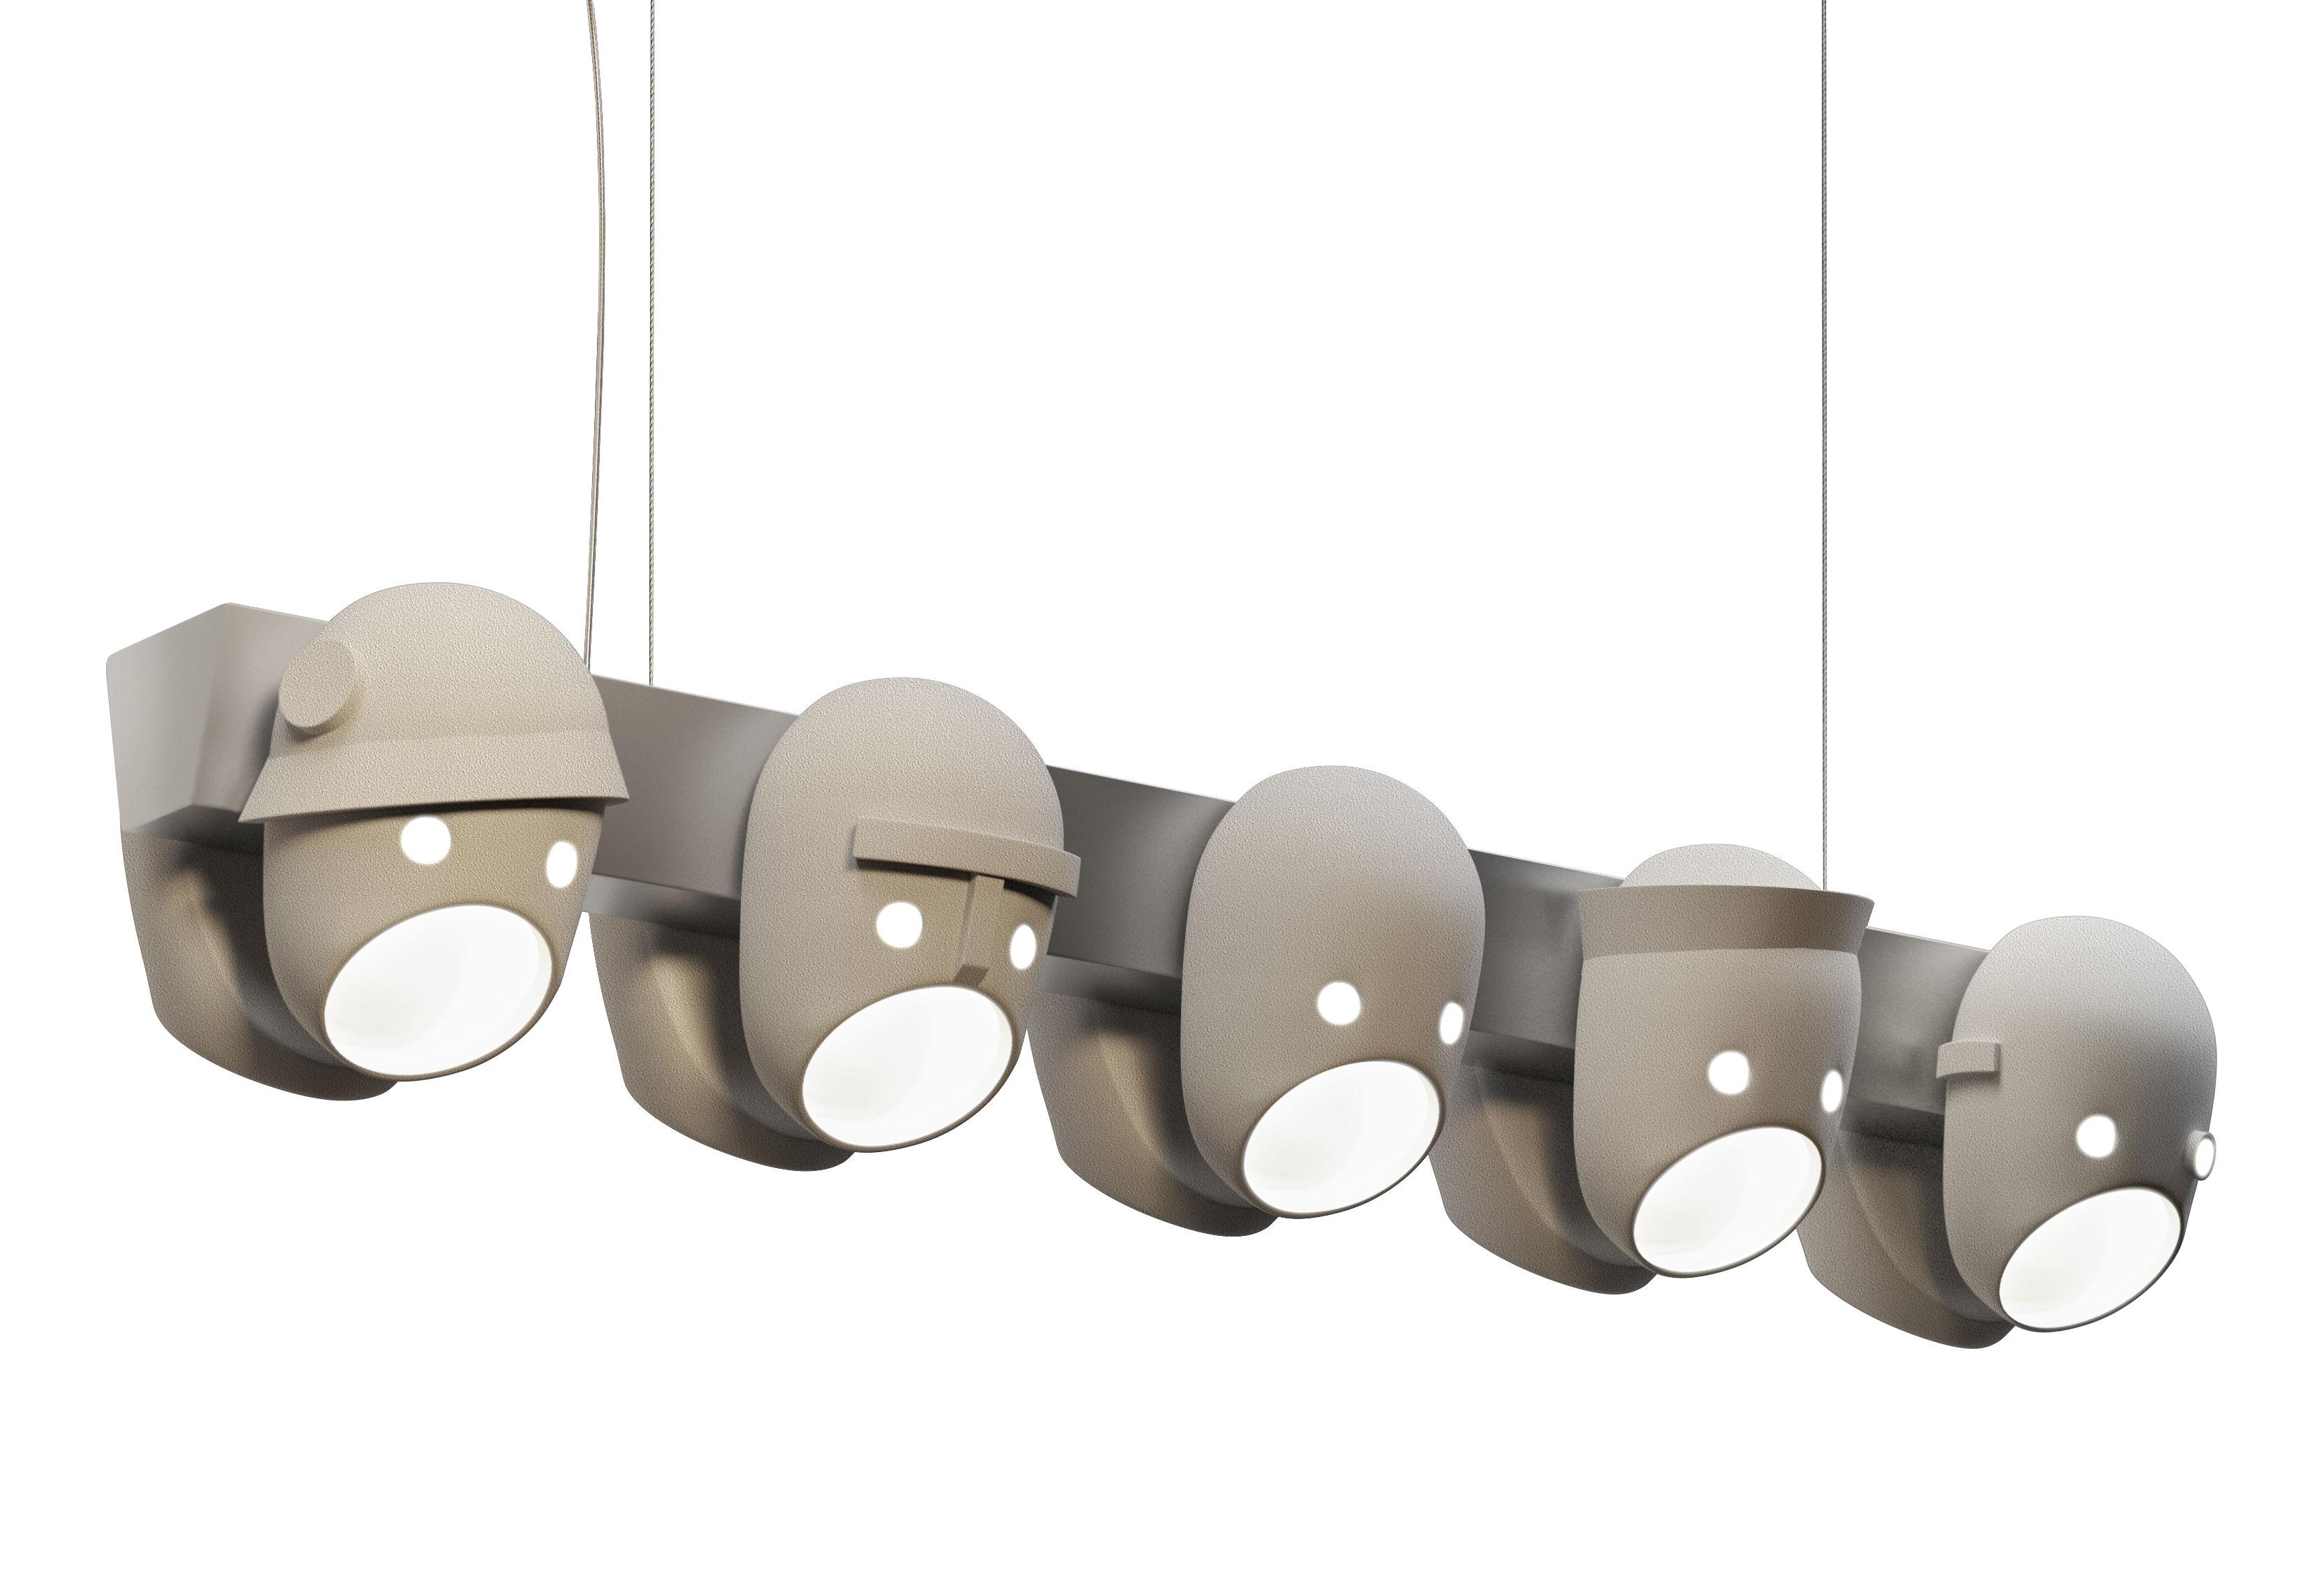 Leuchten - Pendelleuchten - The Party Pendelleuchte LED / Keramik - L 120 cm - Moooi - Grau-beige - Keramik, lackiertes Aluminium